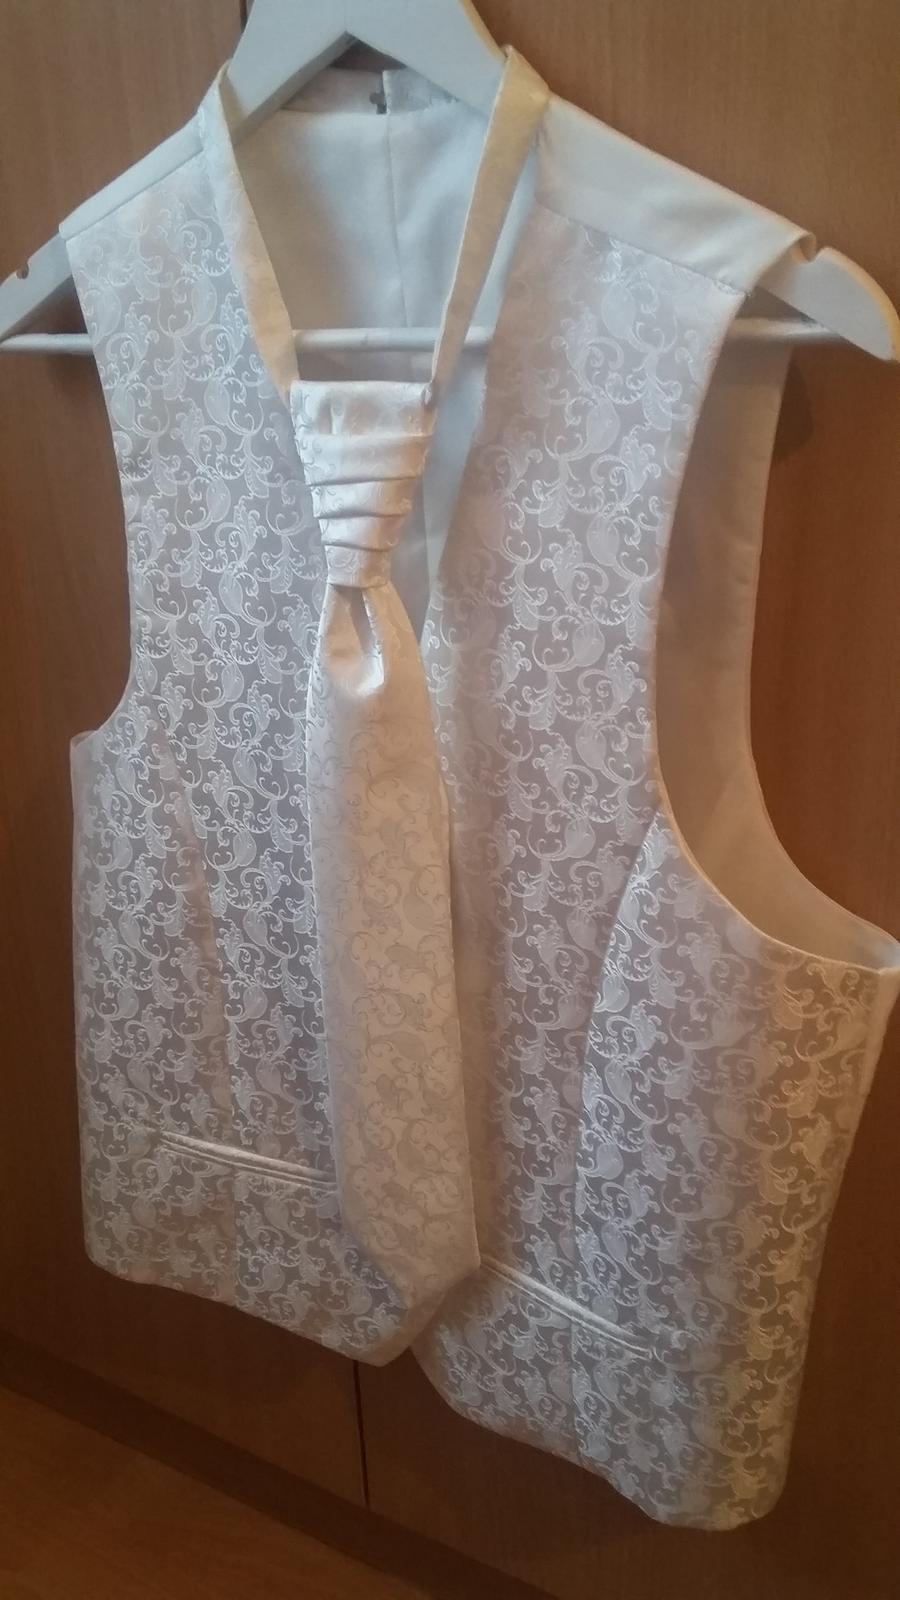 Svadobna vesta, kravata, vreckovka - Obrázok č. 1